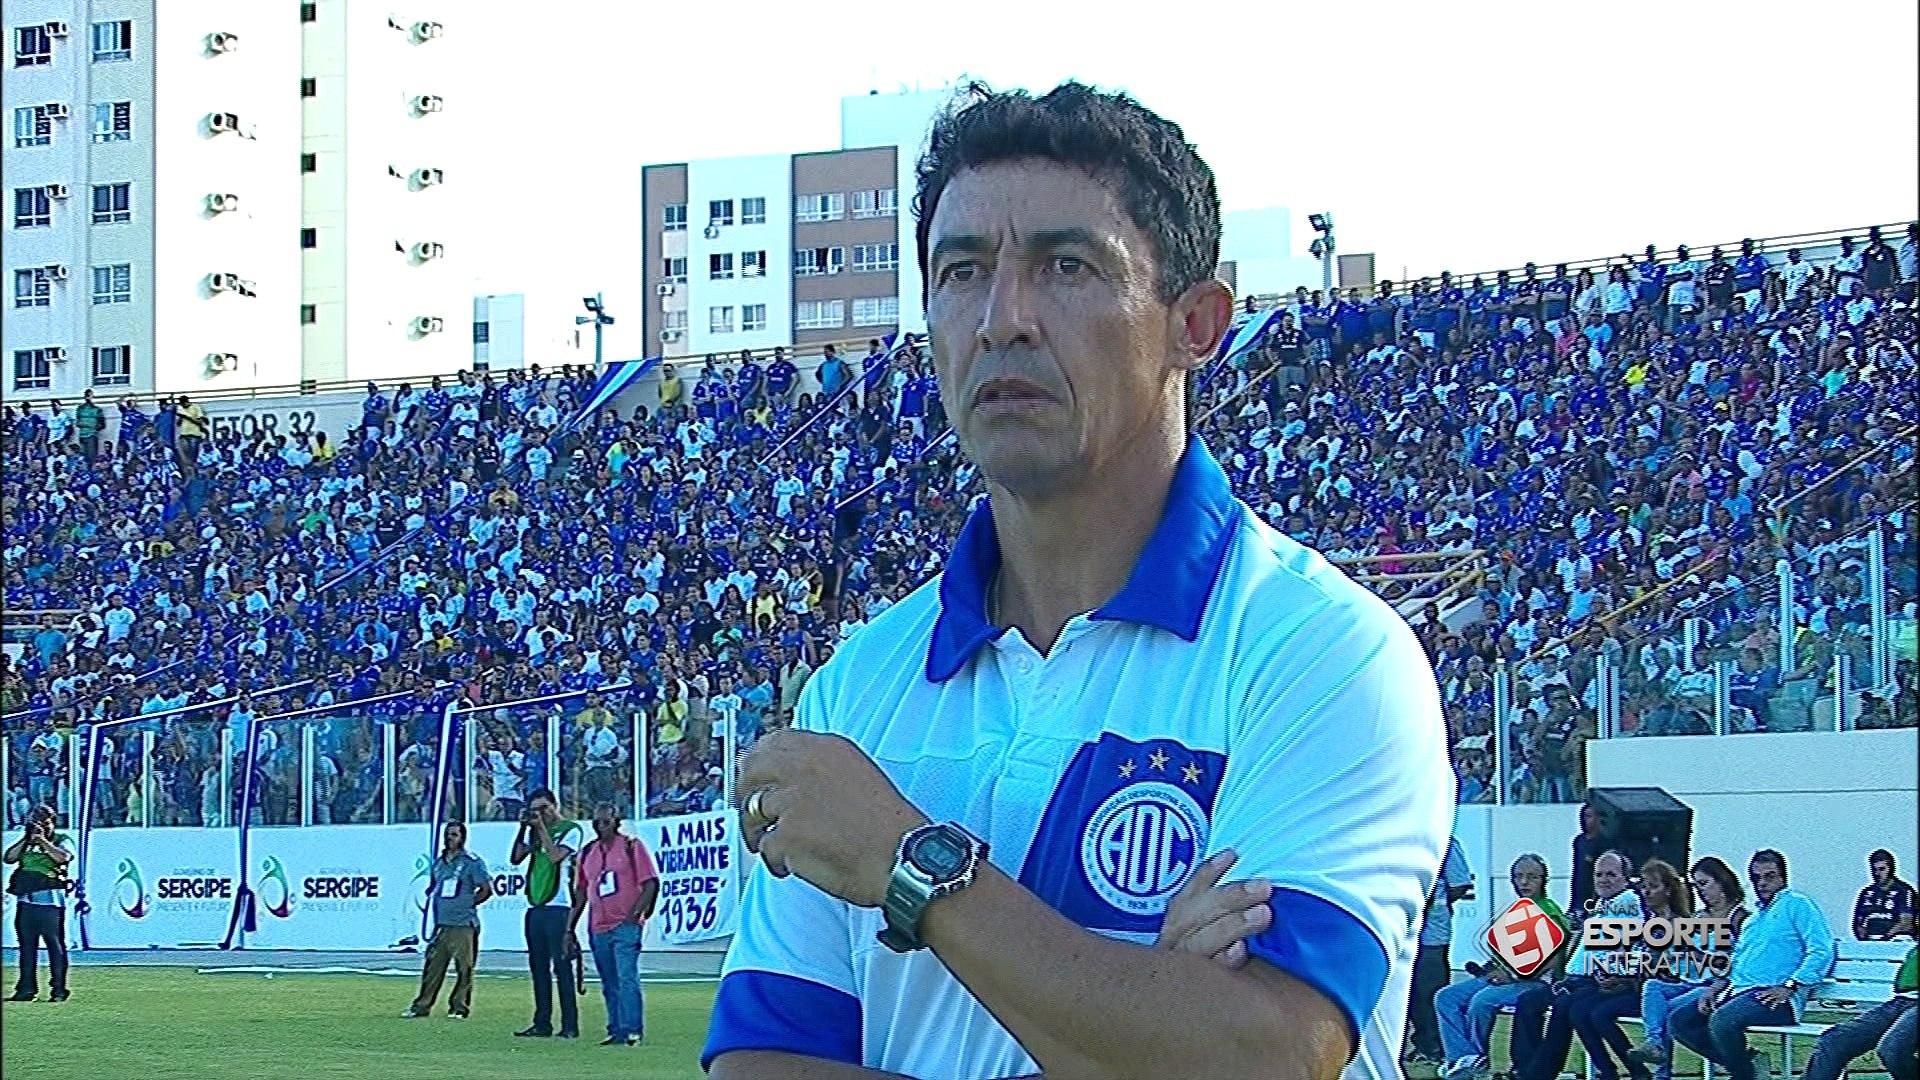 Por pouco! Time do Sergipe faz bela jogada e Rafael Sandes defende